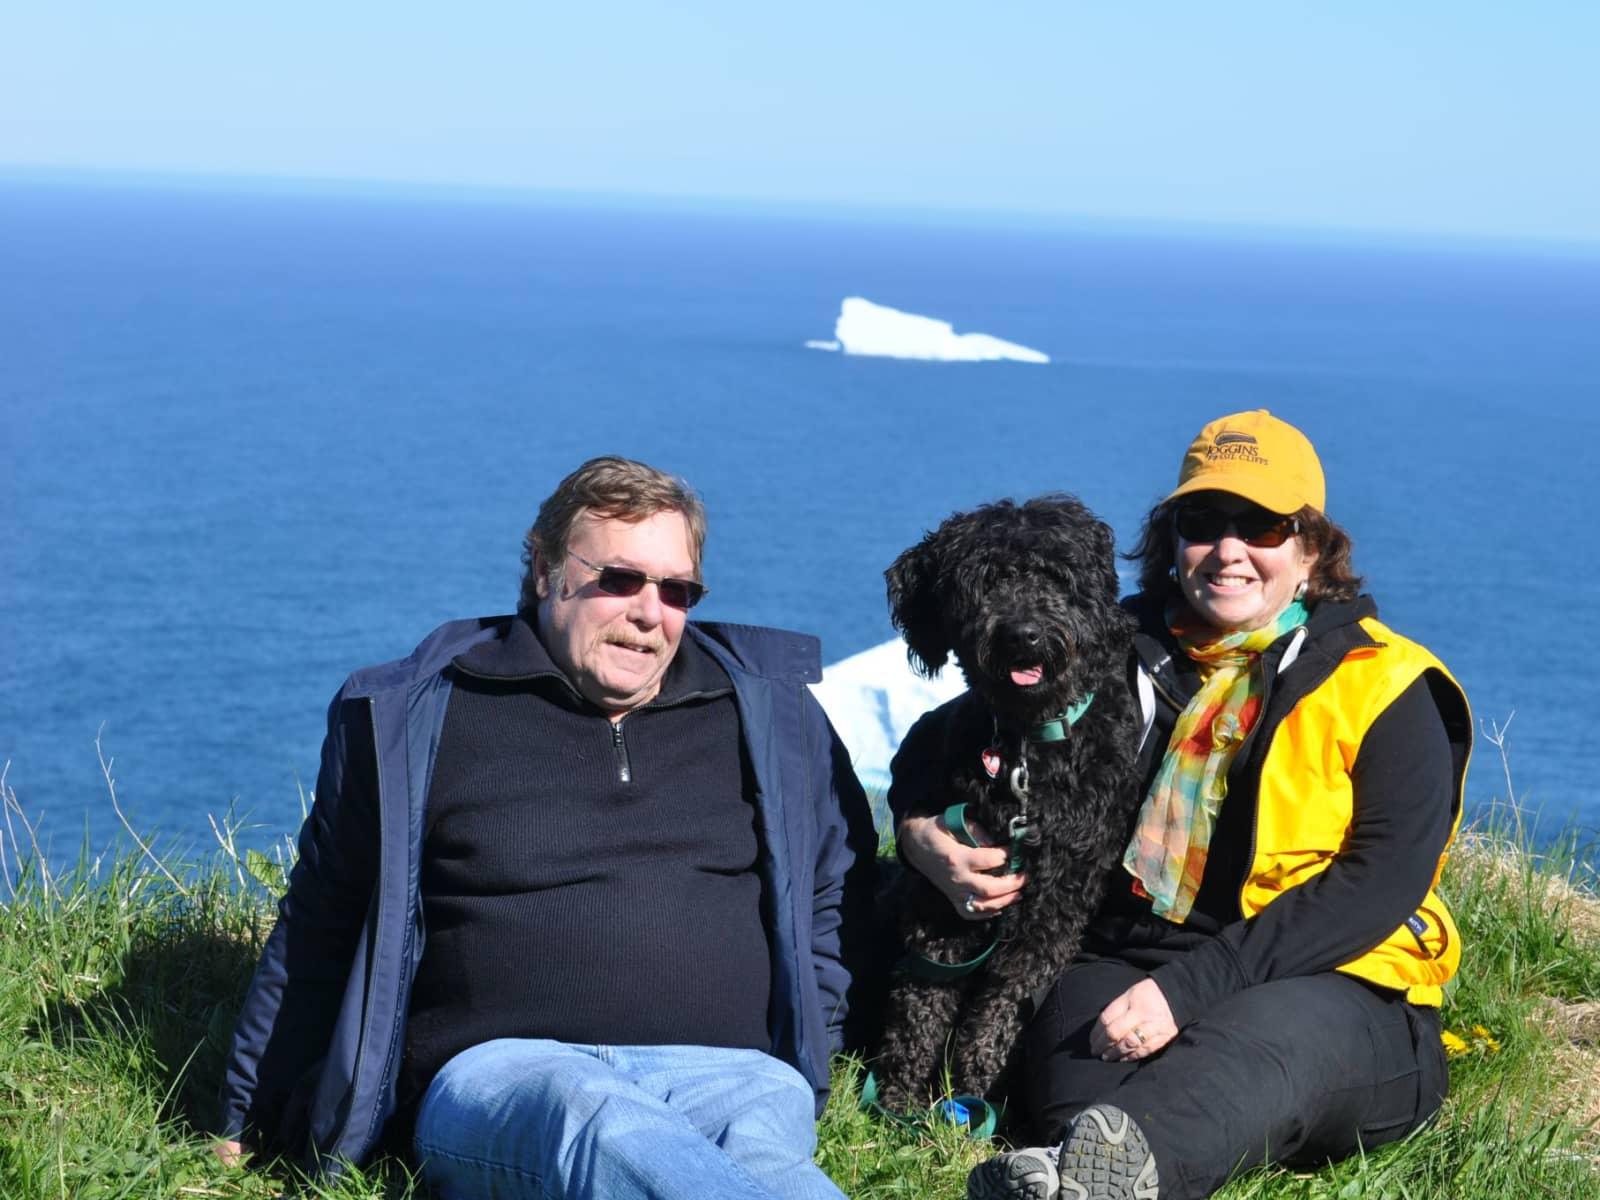 Jamie & Greg from Charlottetown, Prince Edward Island, Canada